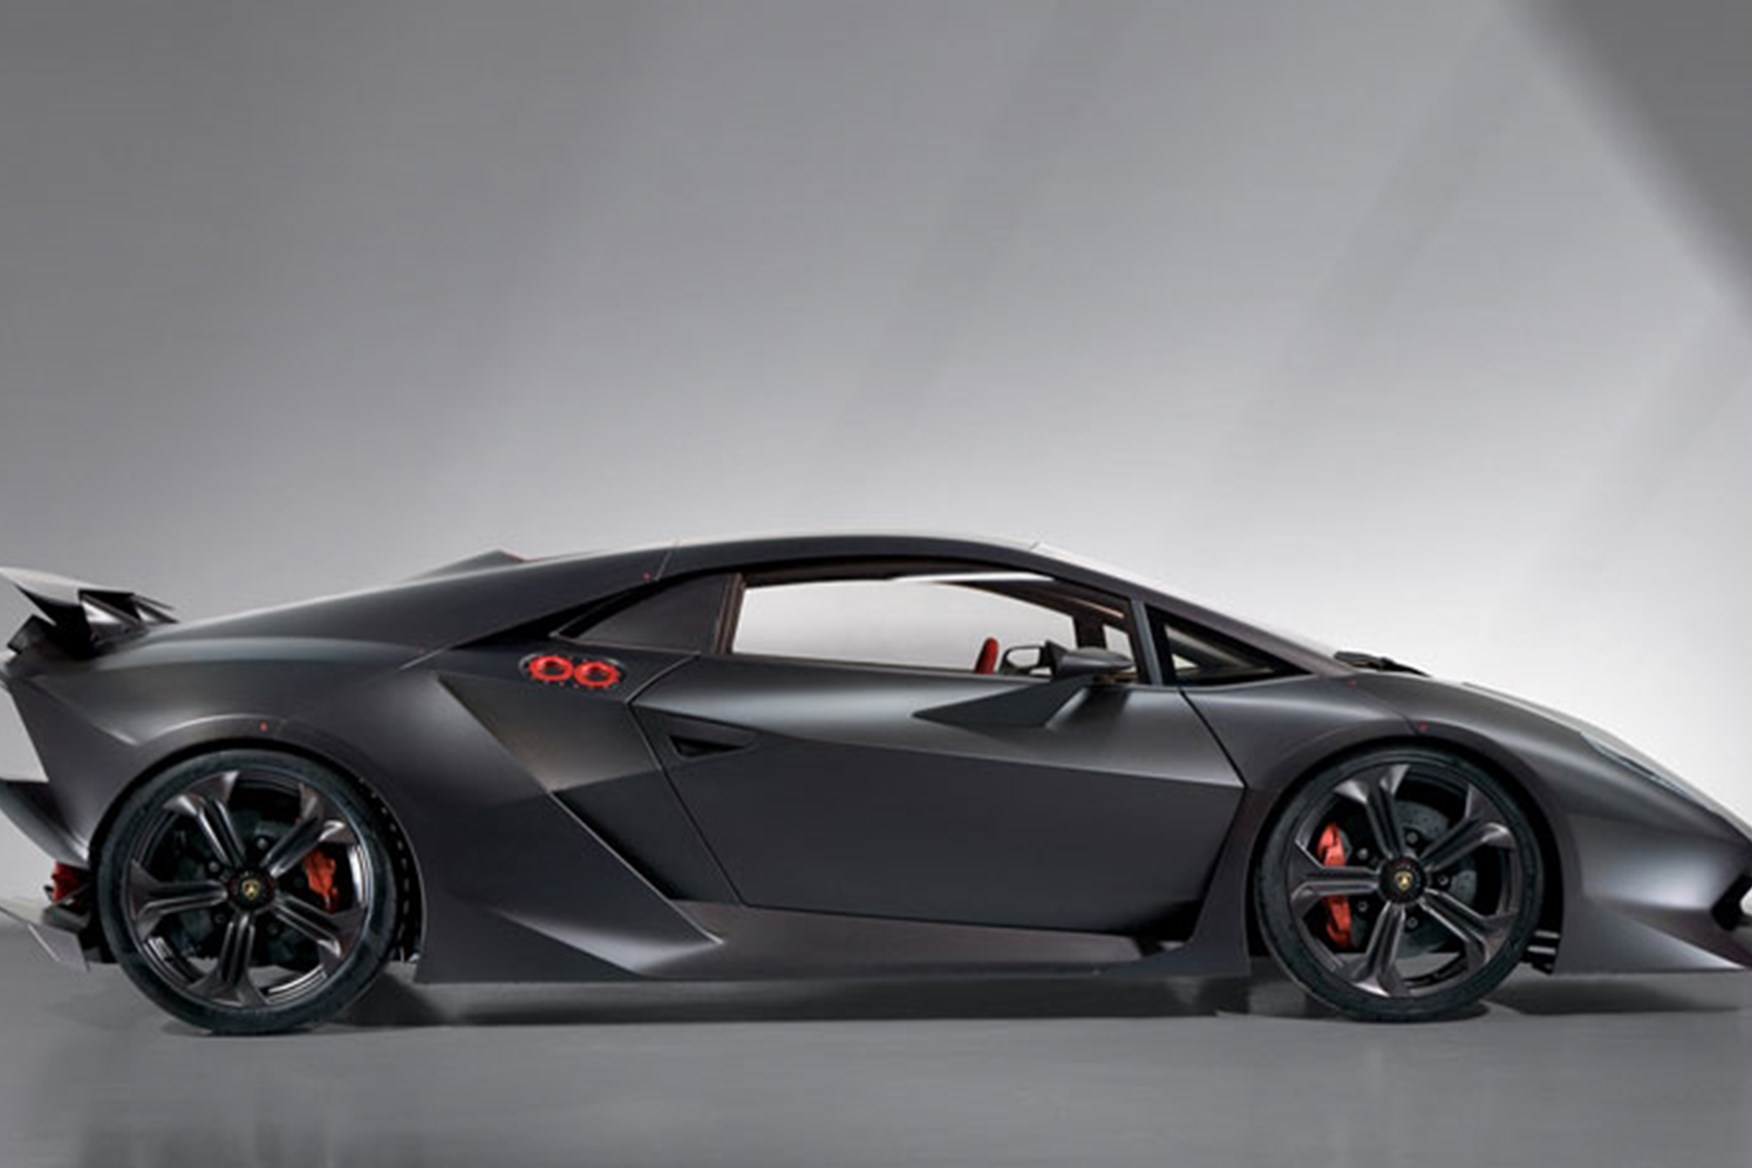 Merveilleux Lamborghini Sesto Elemento (2010): The All Carbonfibre Concept Car By CAR  Magazine